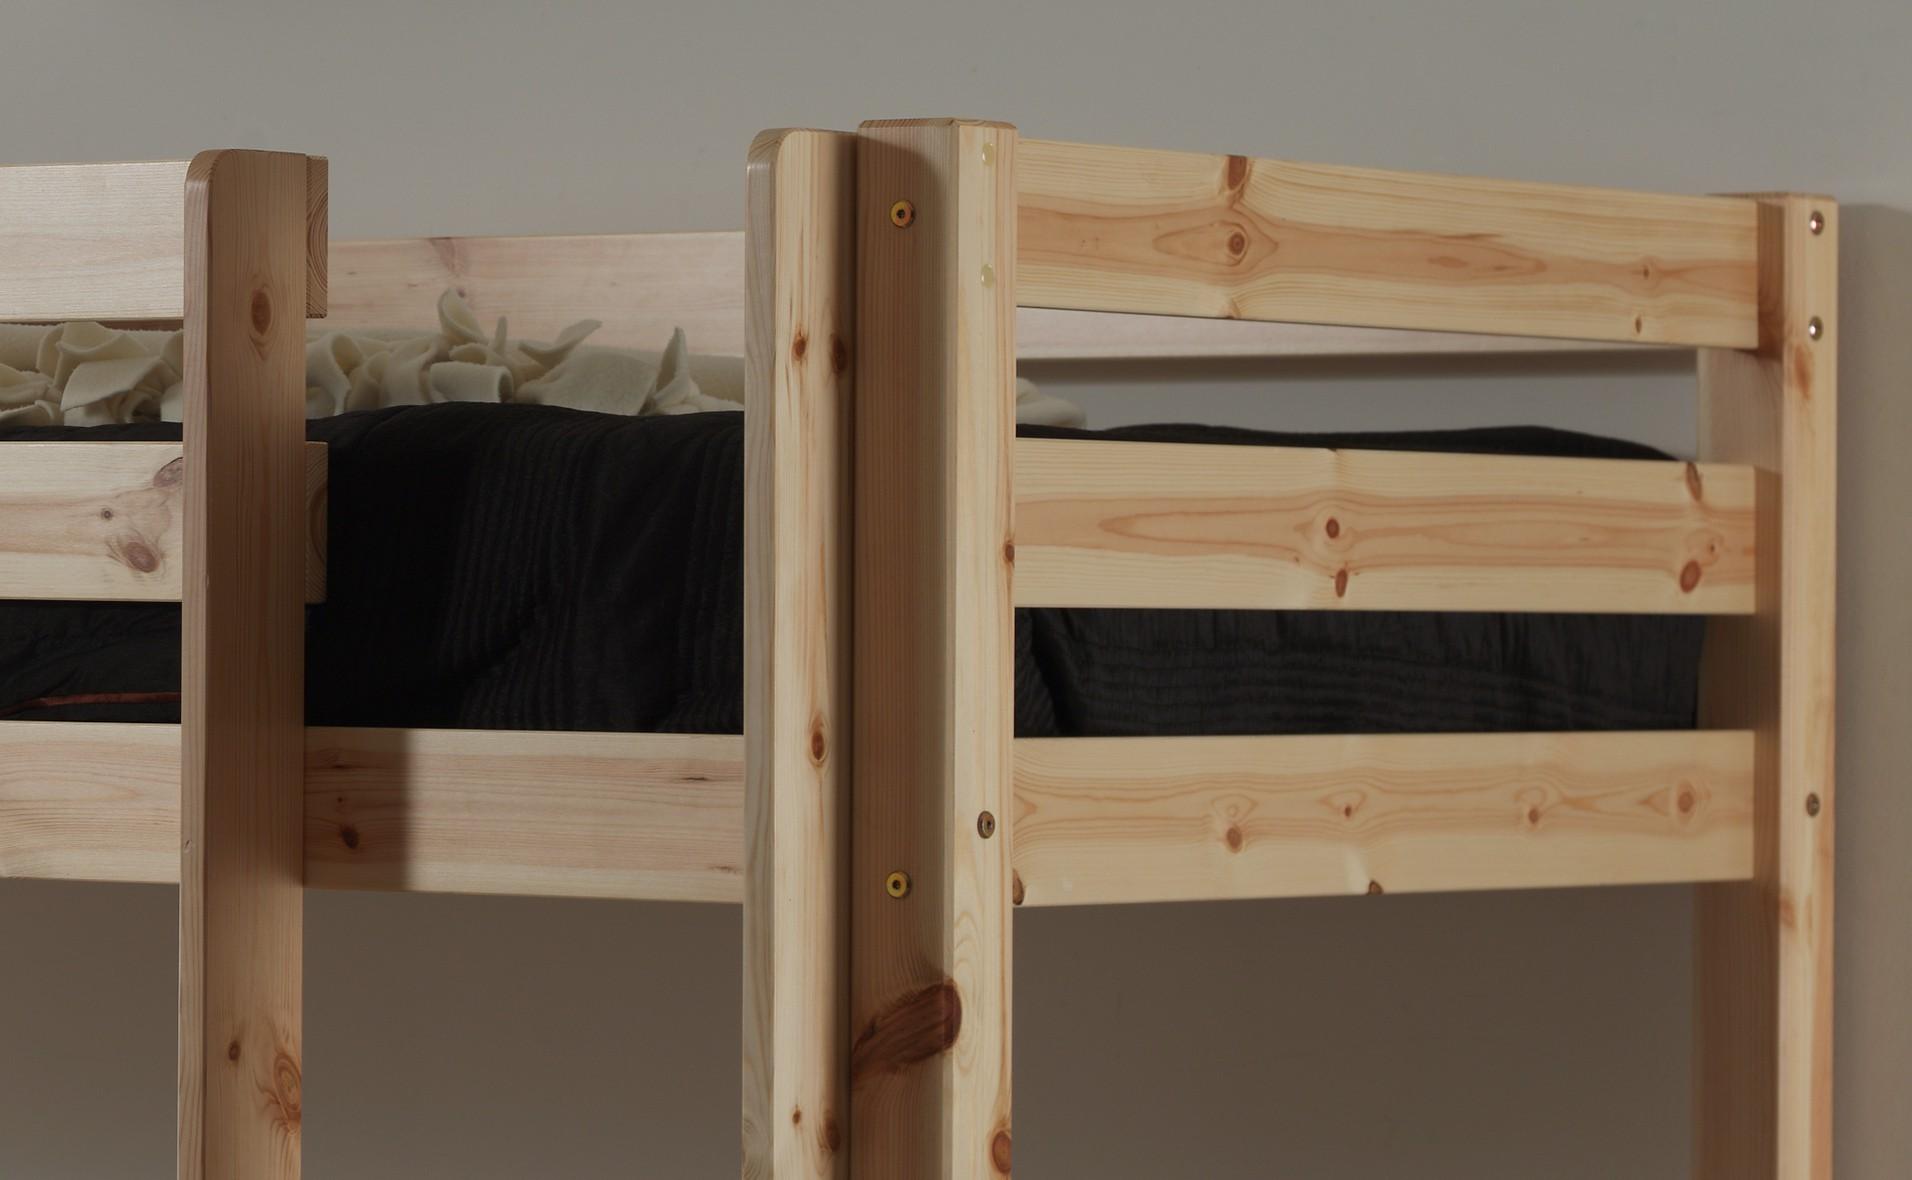 Etagenbett Pino : Etagenbett pino ii kiefer massiv graphit ohne rollschubladen